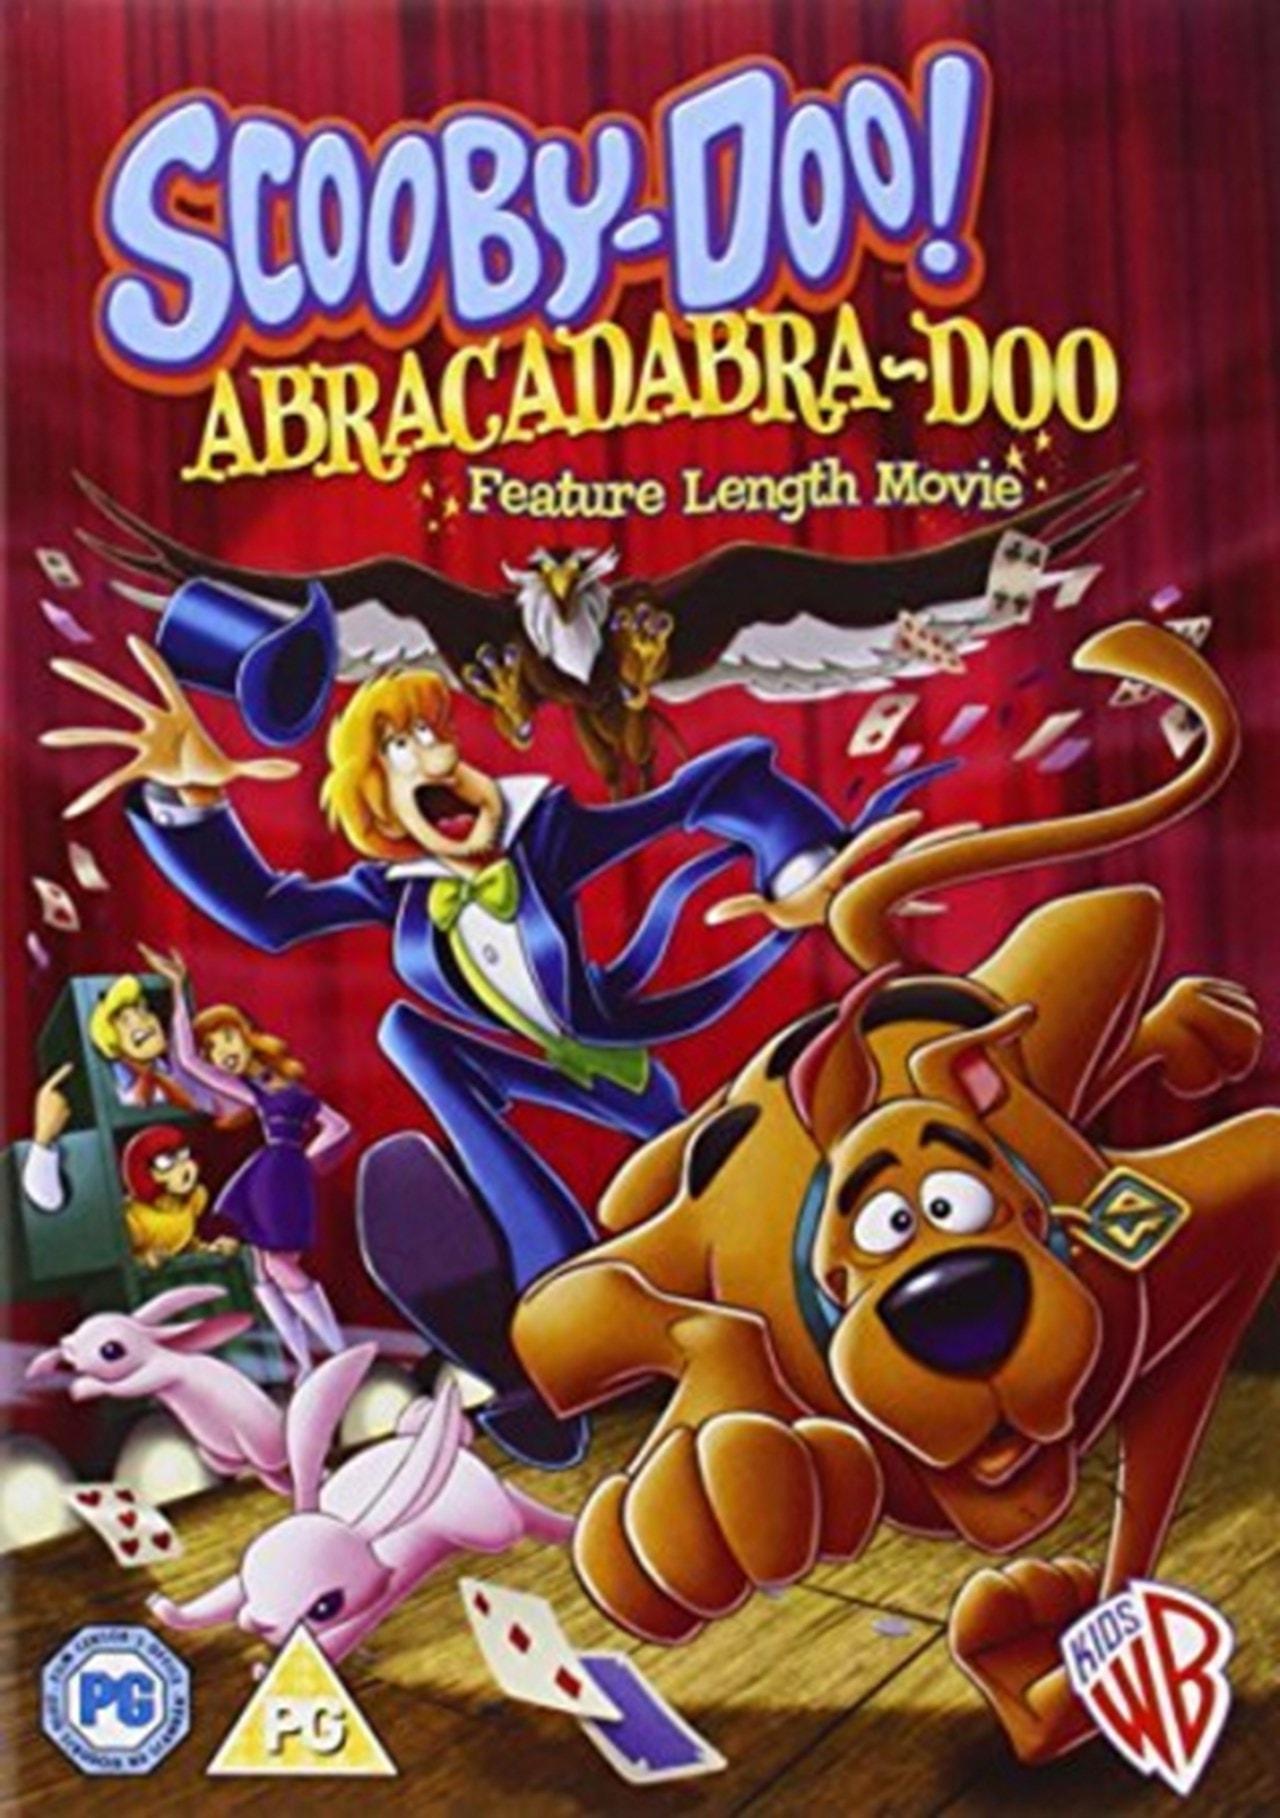 Scooby-Doo! Abracadabra-Doo - 1